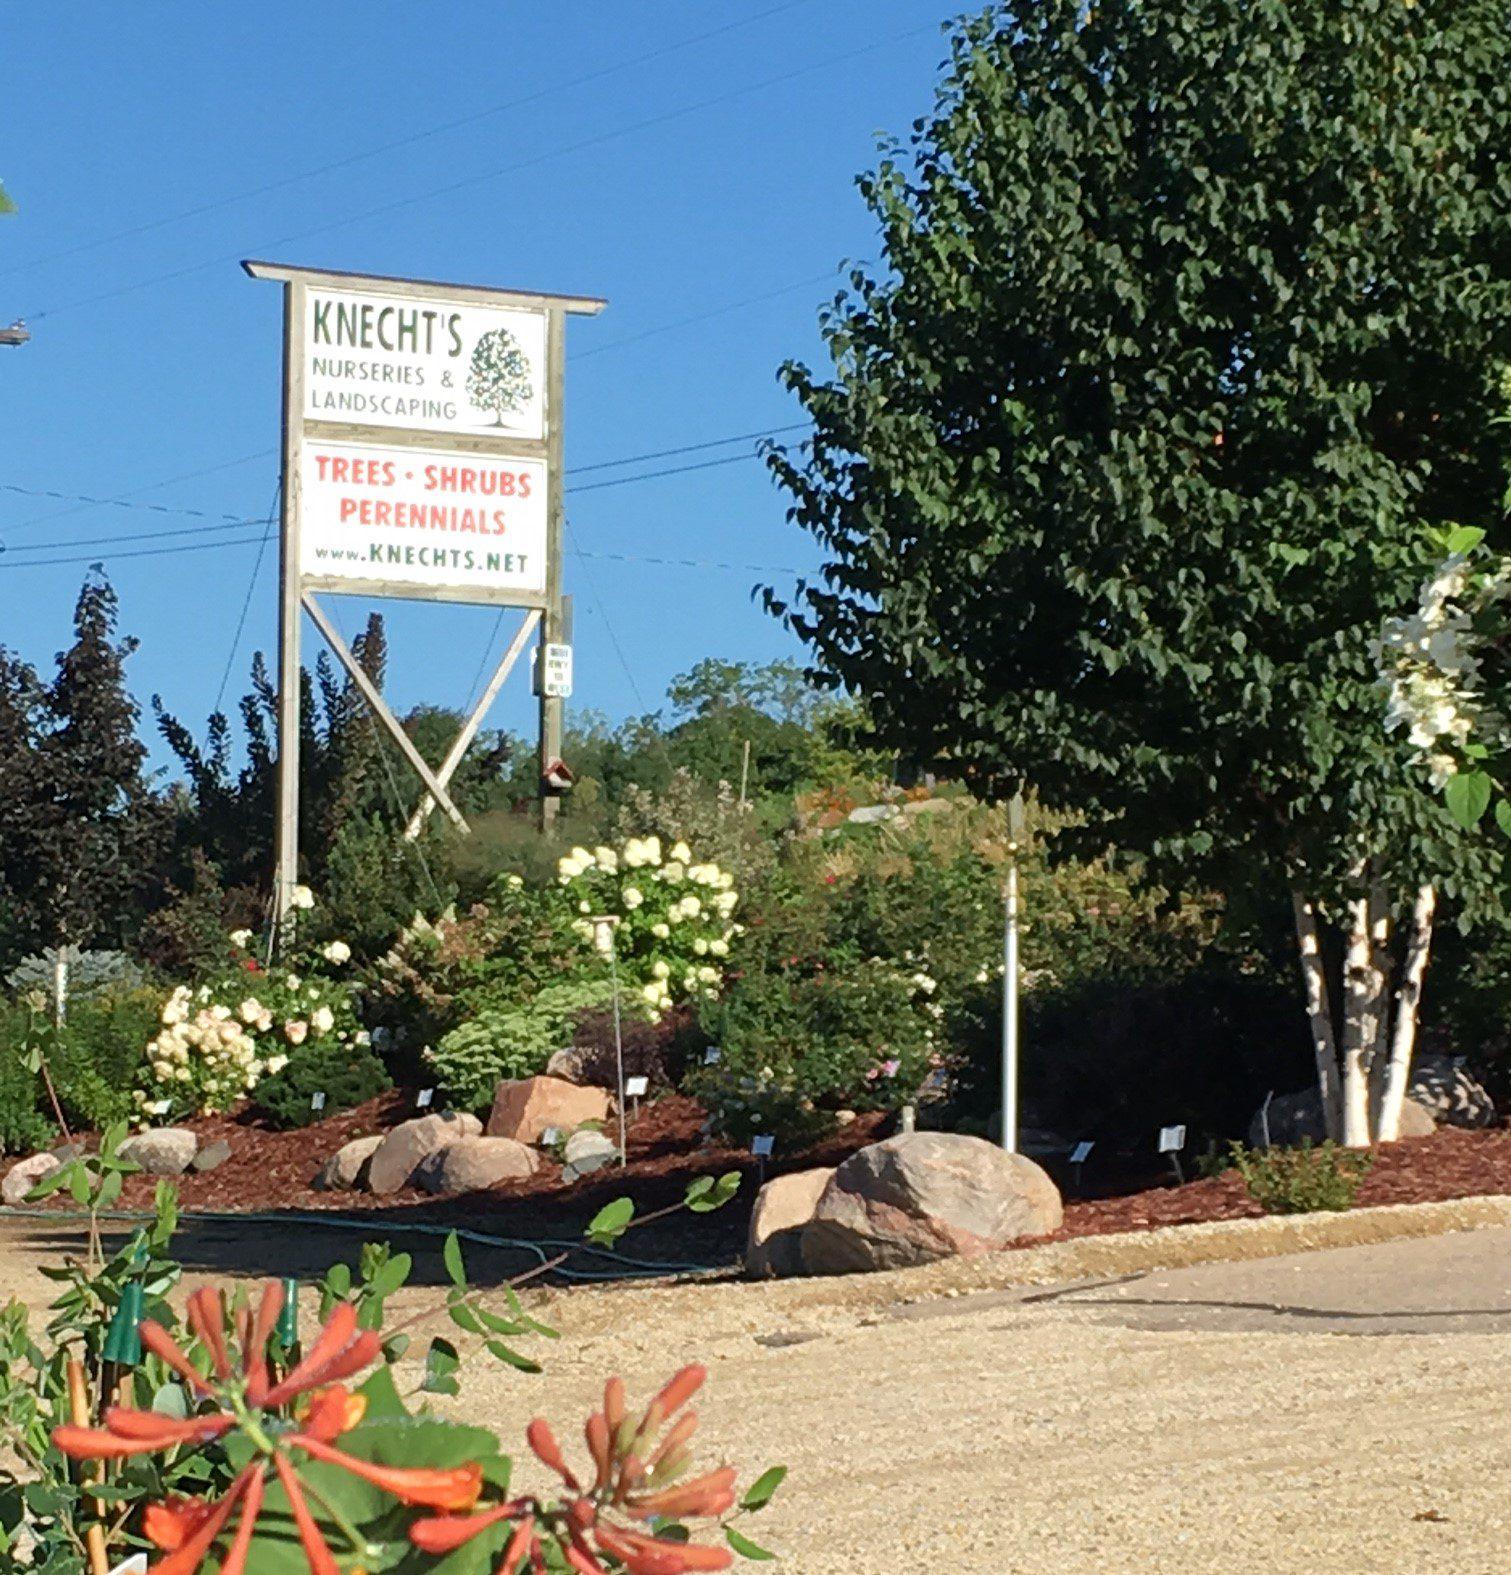 Home Knechts Nurseries Landscaping